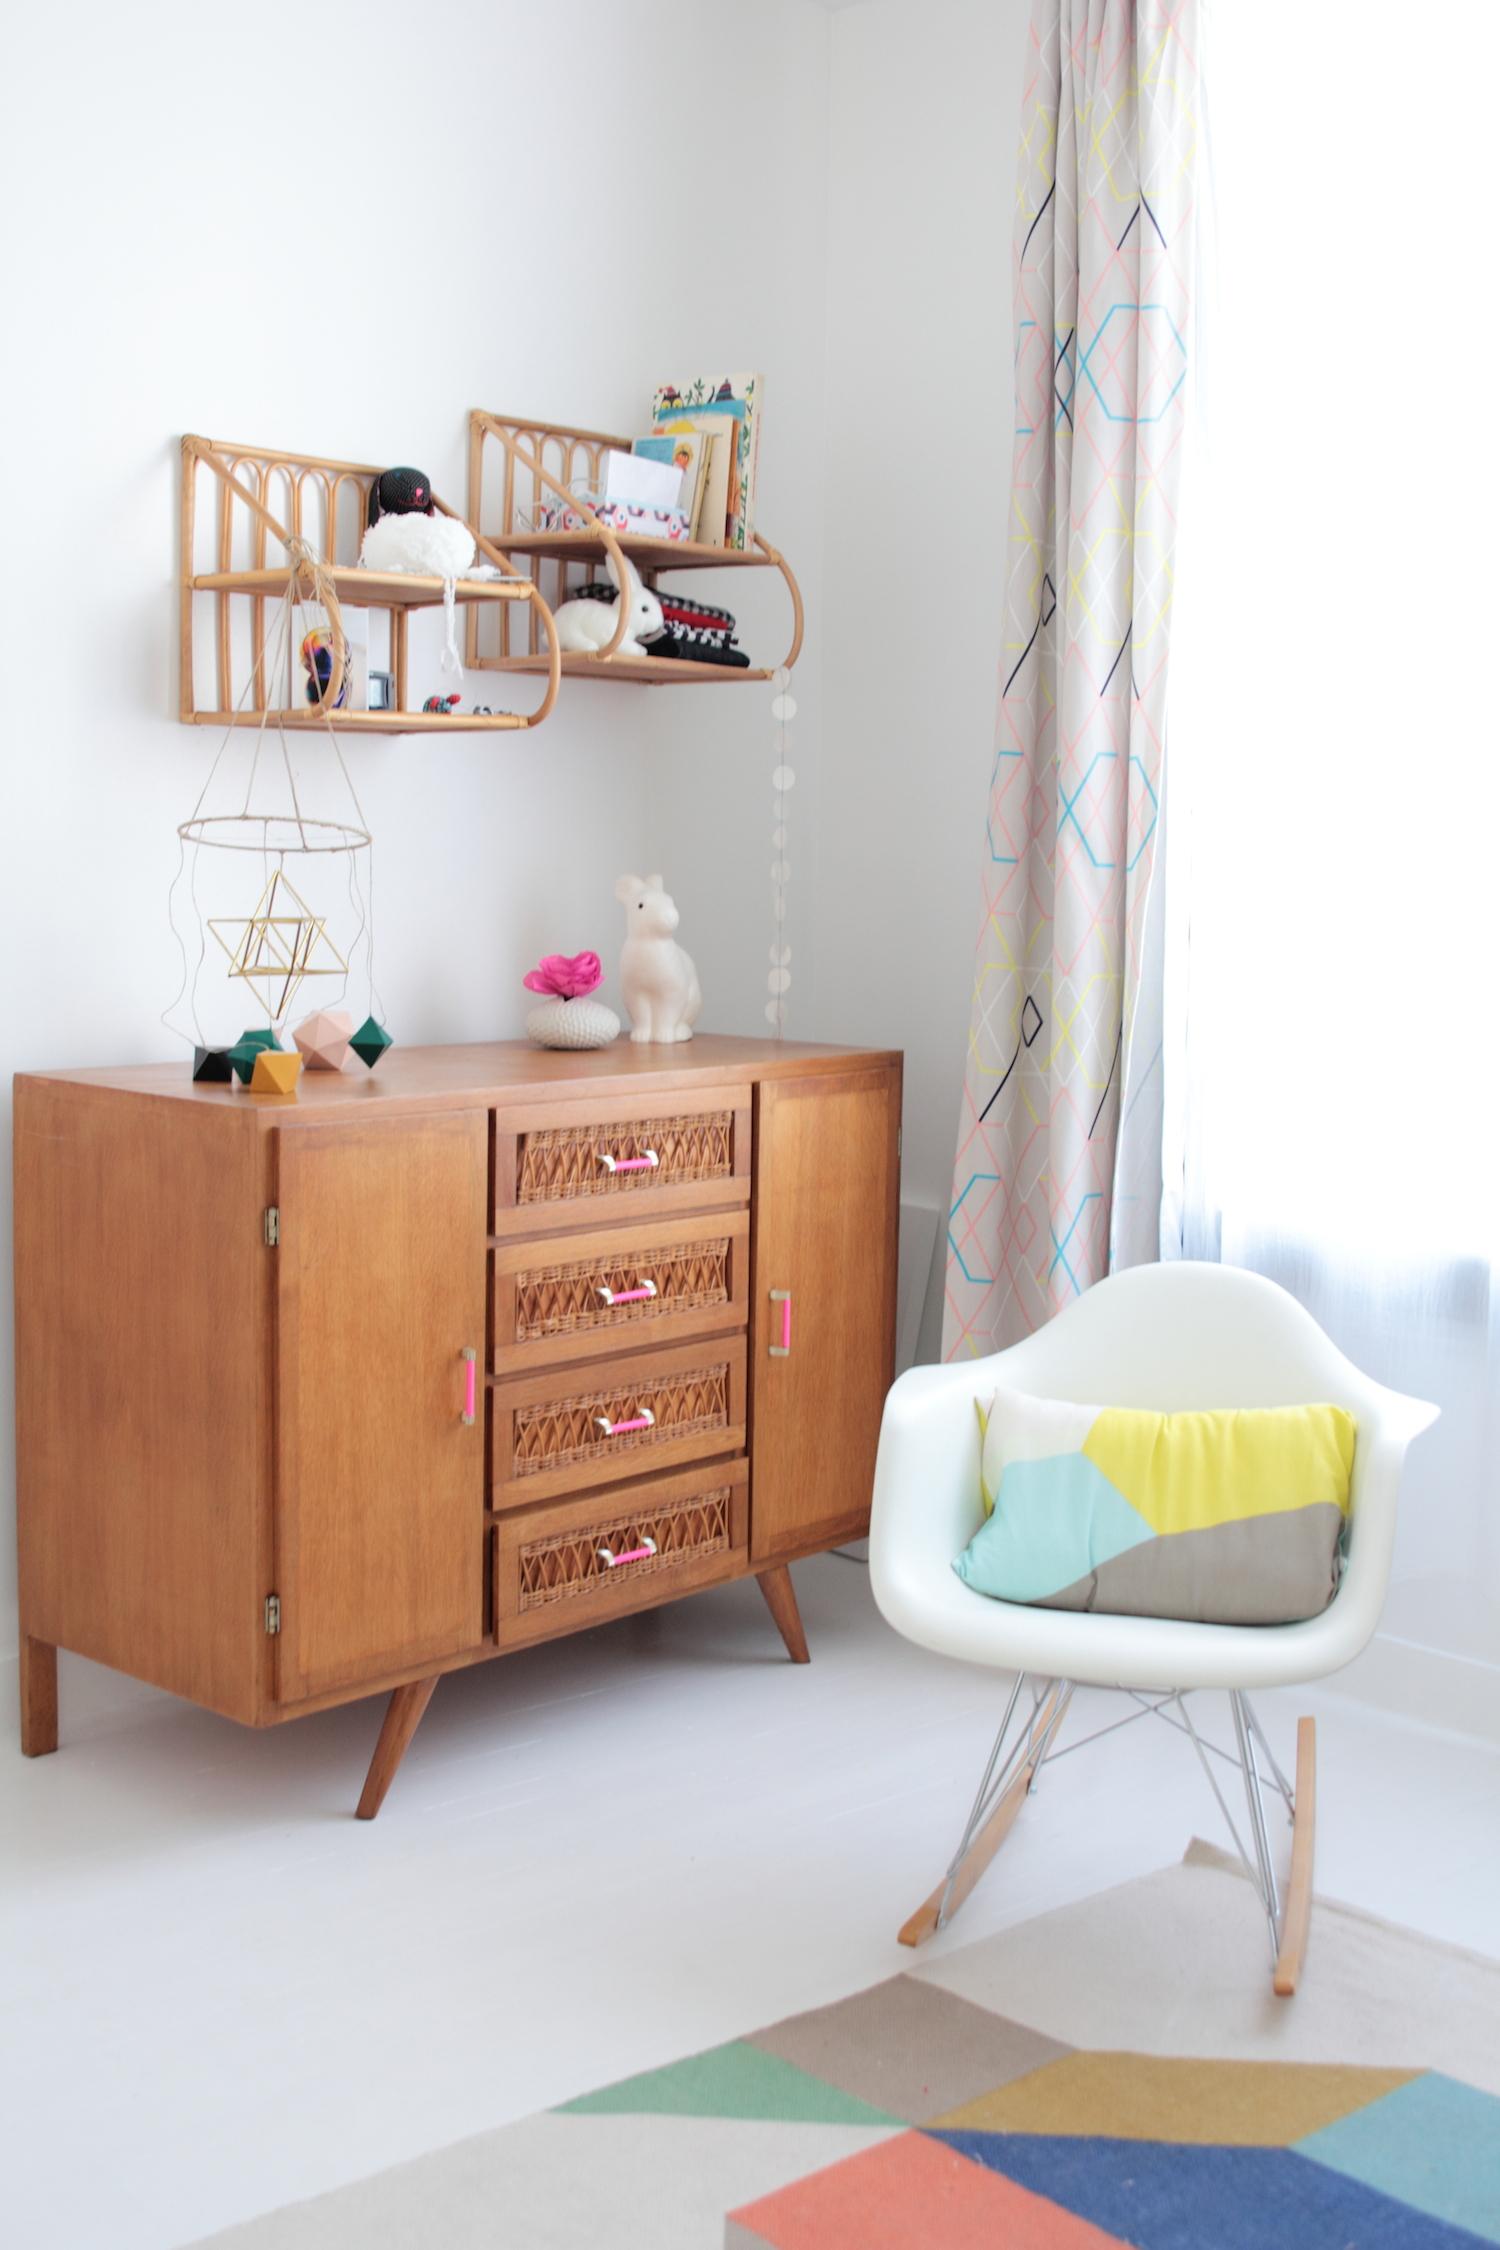 home tour laetitia vert cerise h ll blogzine h ll blogzine. Black Bedroom Furniture Sets. Home Design Ideas